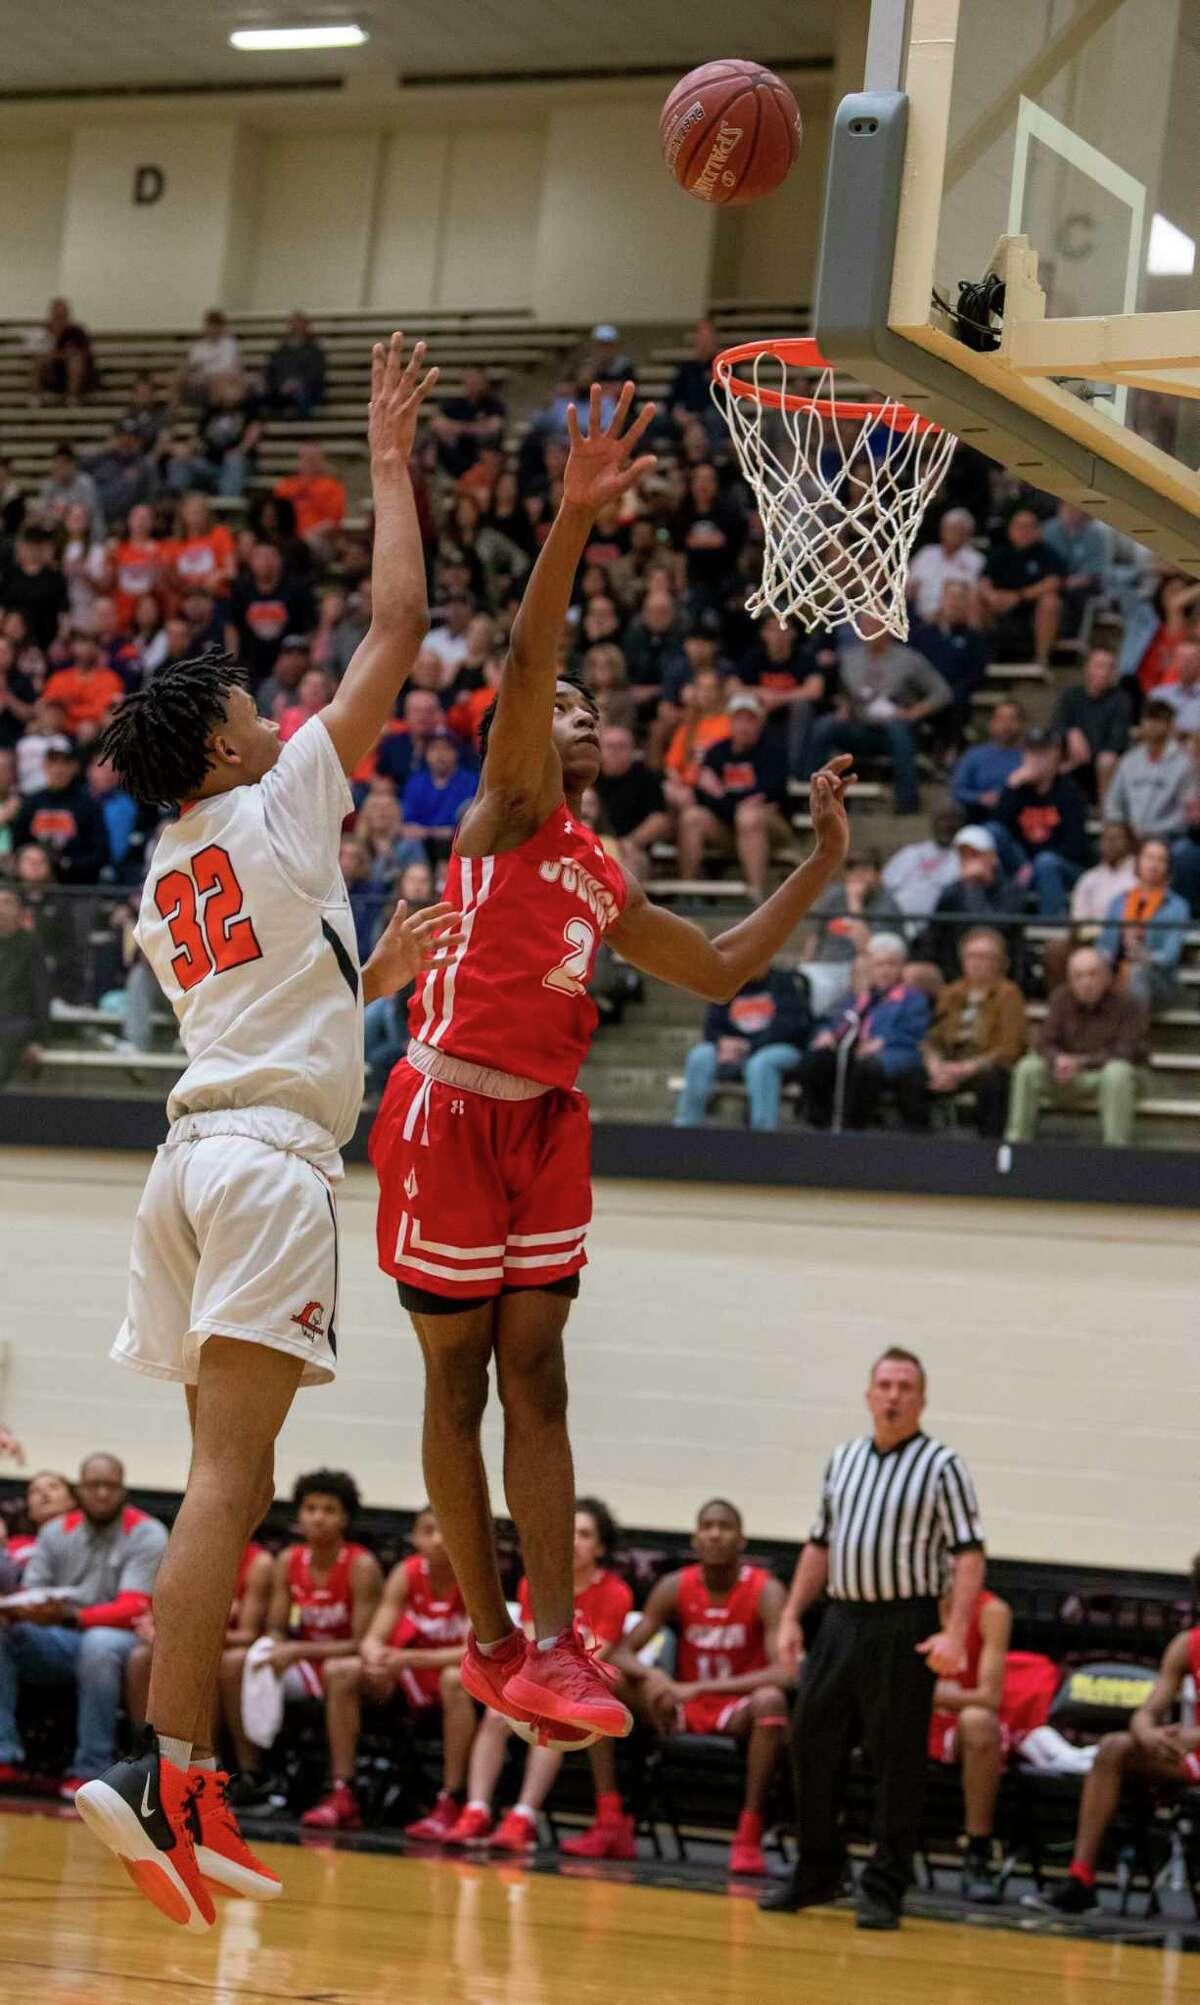 Brandies Bronco Kyle Schaefer tries to score against Judson Rockets Anariss Brandon during the first half of a High School Basketball Class 6A Regional Final on Saturday, March 7, 2020. Brandies beat Judson 68-75.